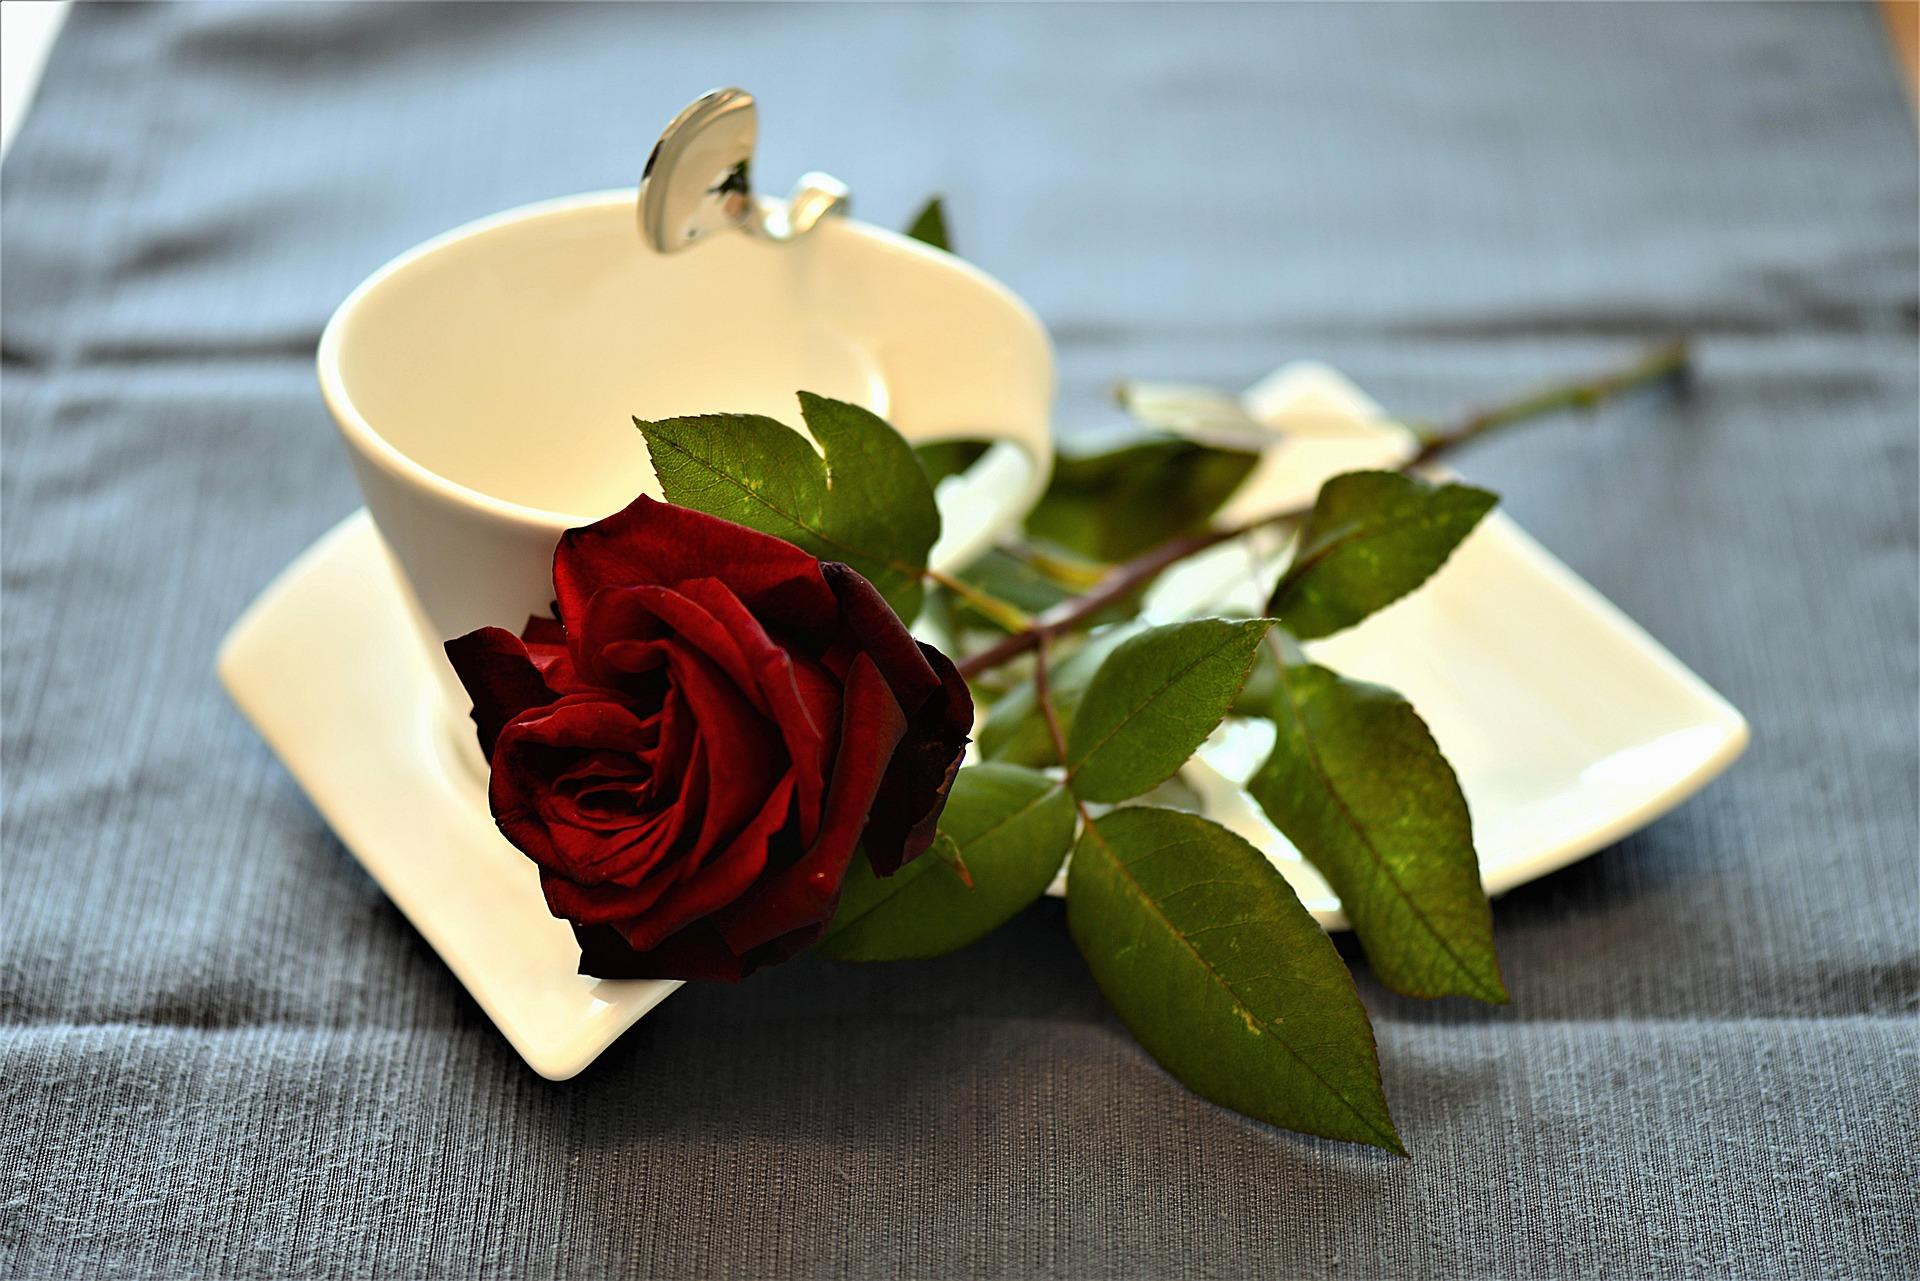 buna dimineata mesaje - sfatulparintilor.ro - pixabay_com - rose-2796228_1920